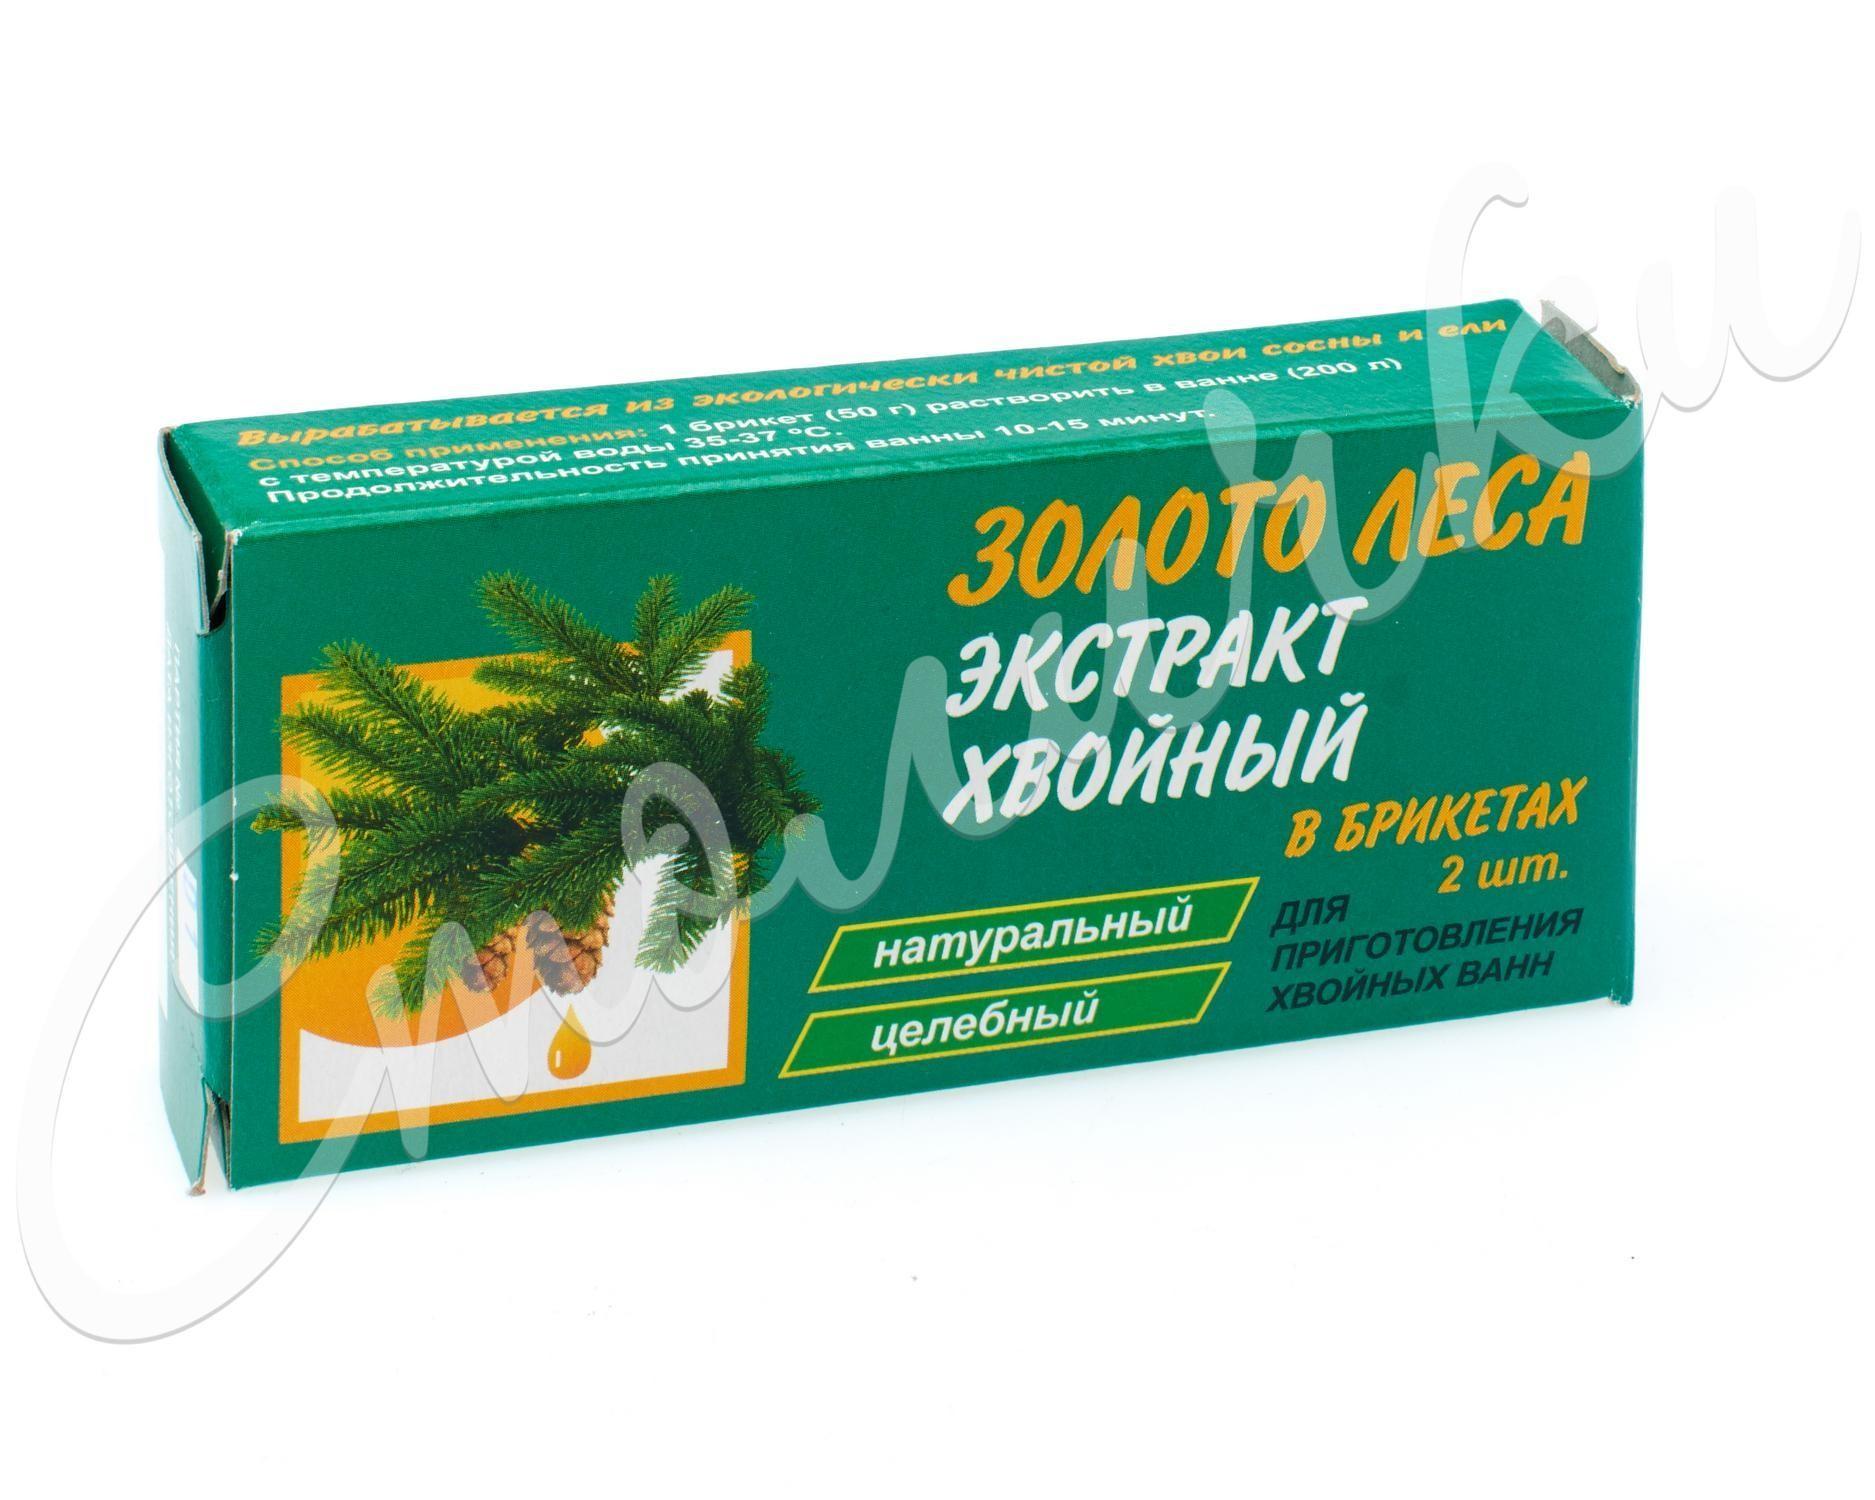 Можно ли в брикетах купить сигареты купить сигареты молдова